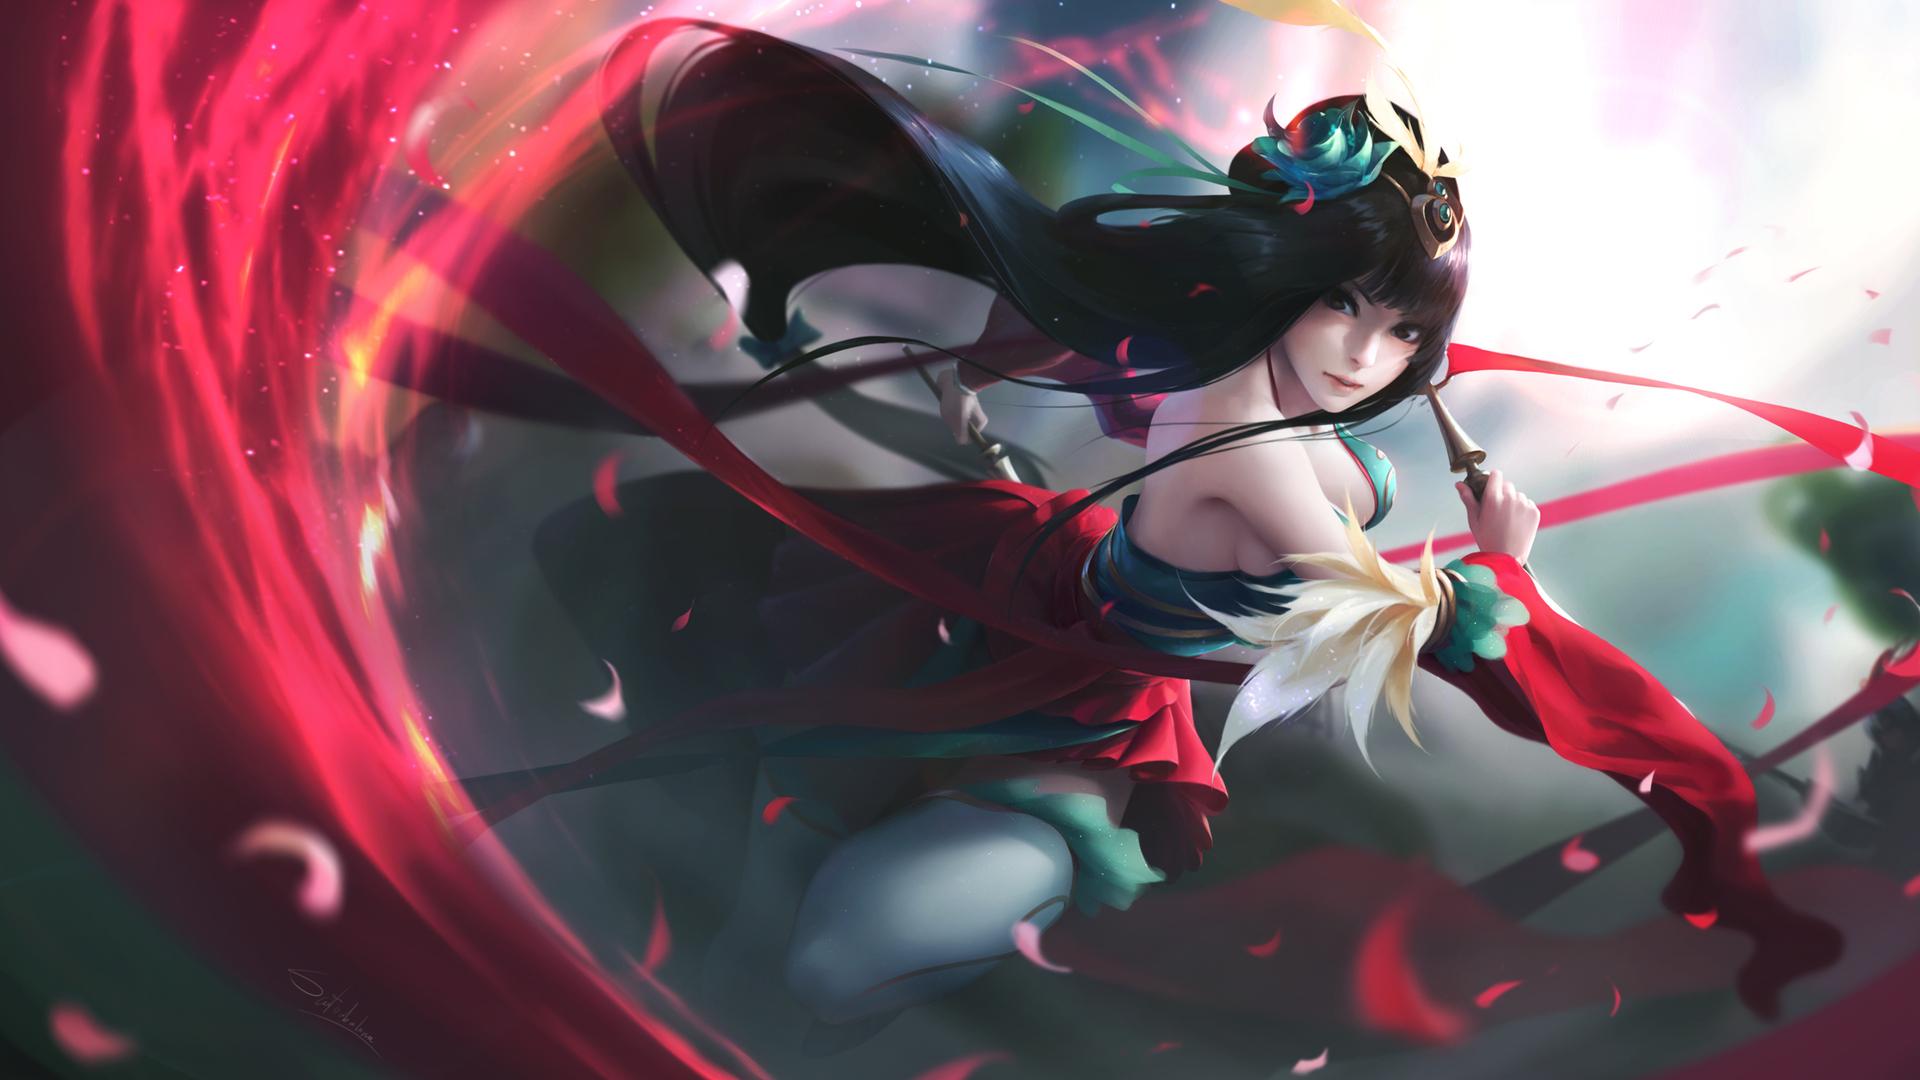 1920x1080 anime warrior long hair girl laptop full hd 1080p hd 4k wallpapers images - 1920x1080 hentai wallpaper ...